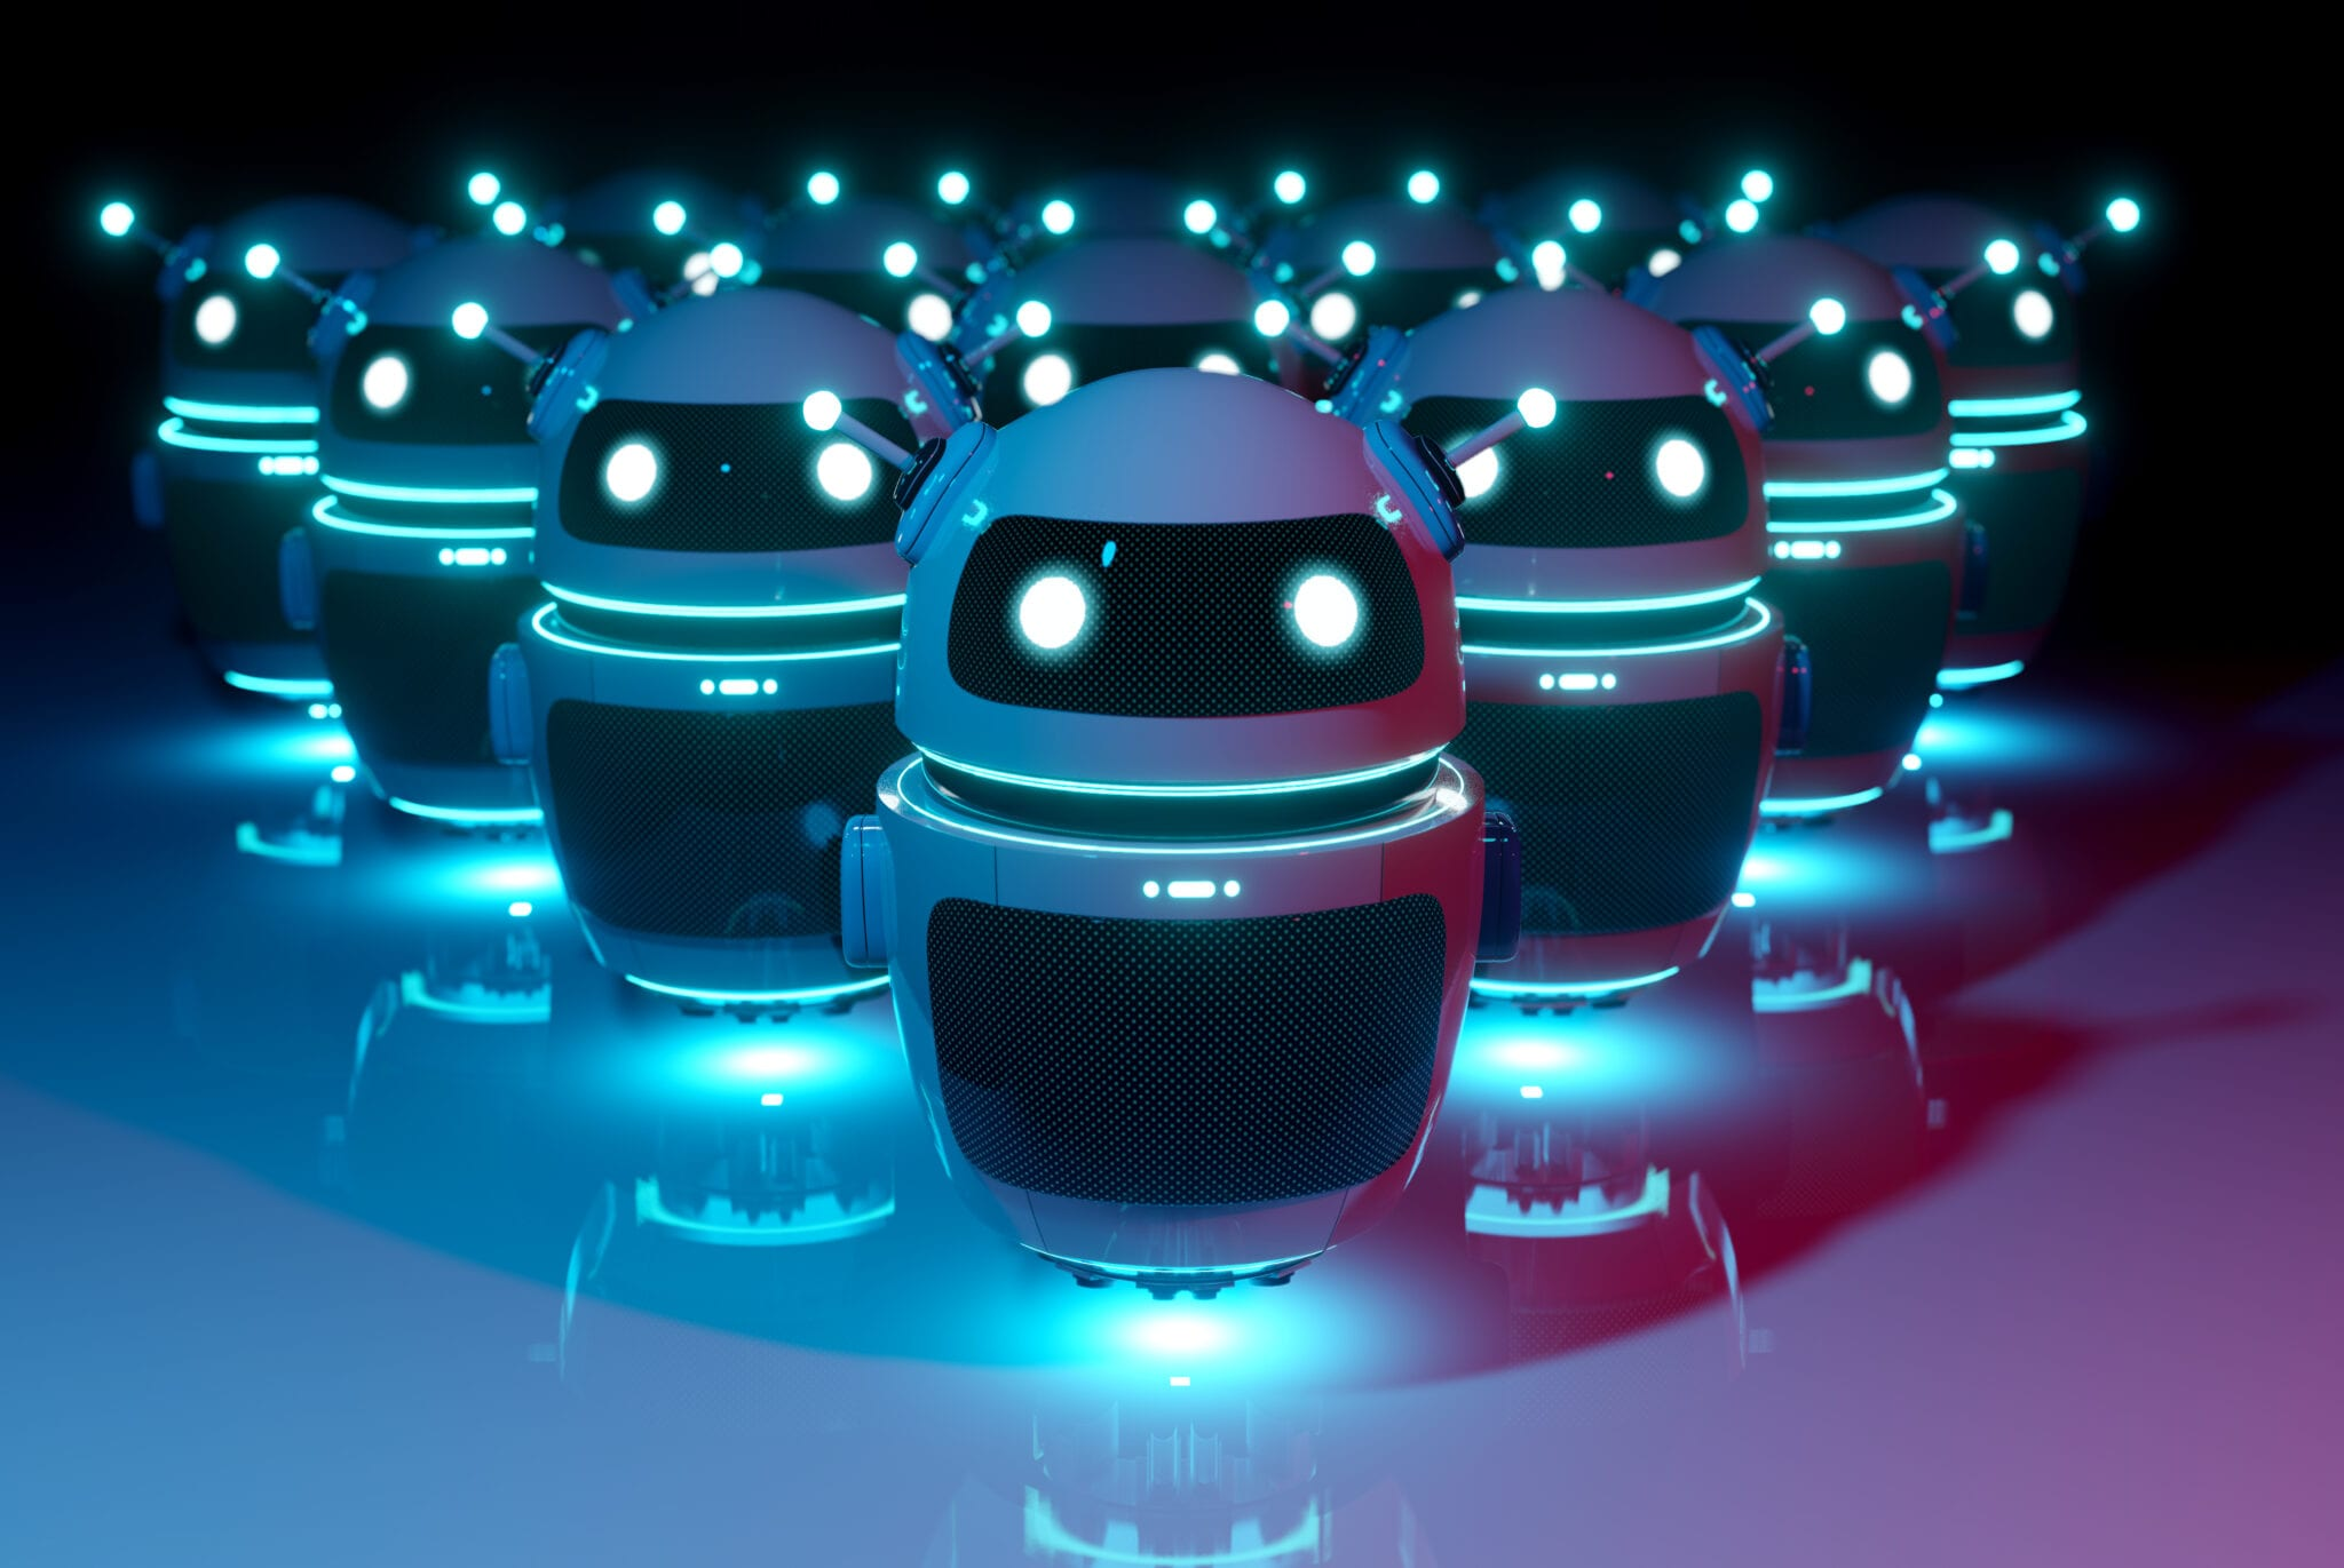 robotica e swarm intelligence